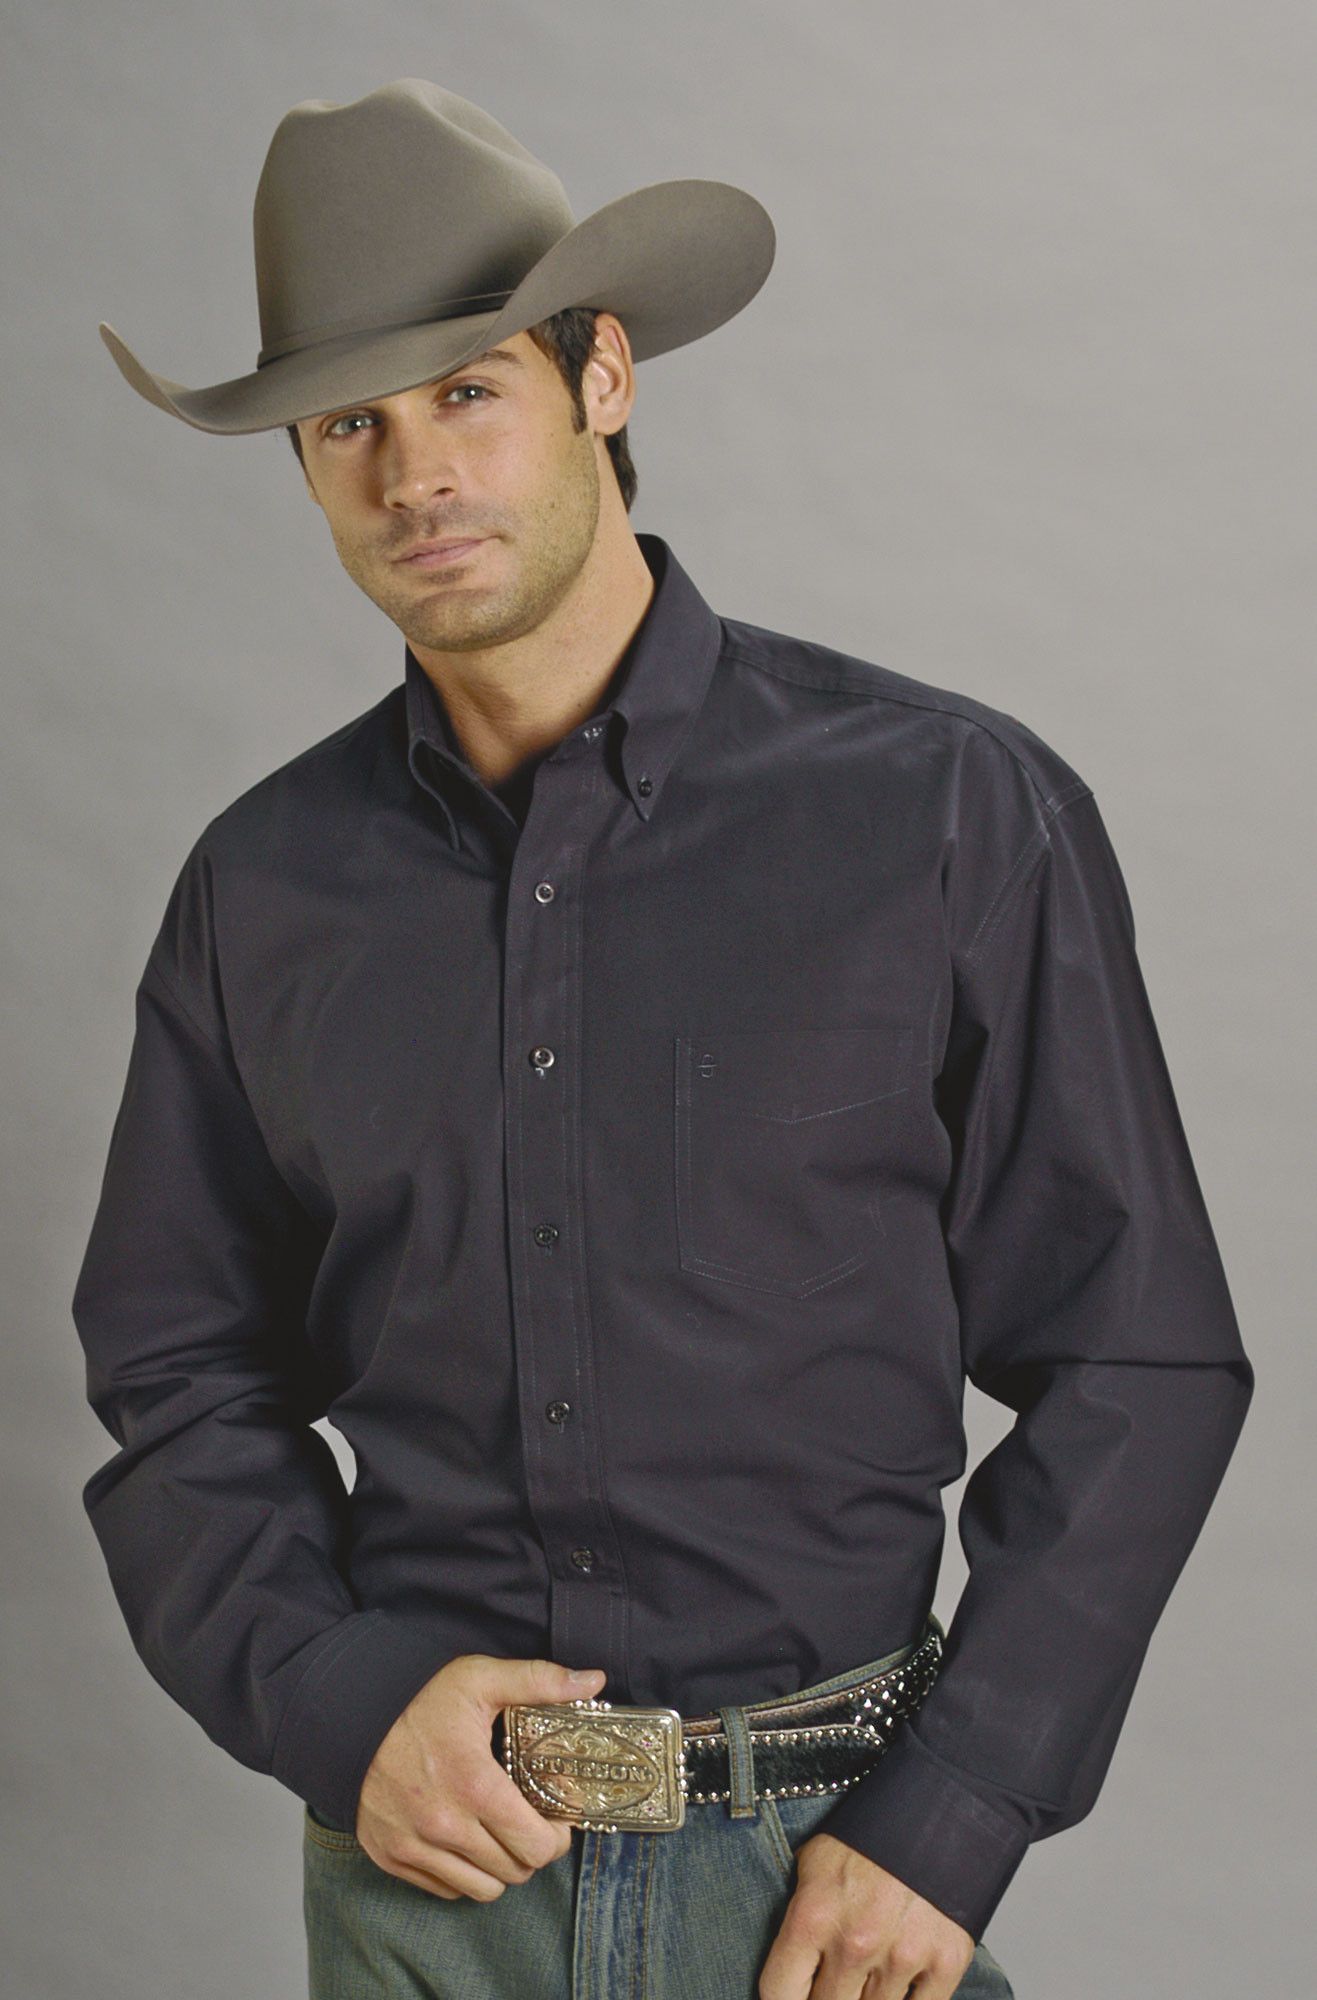 ff3746f5a Stetson Mens Black 100% Cotton L S 1 Pocket Western Shirt Solid Poplin  Calçado